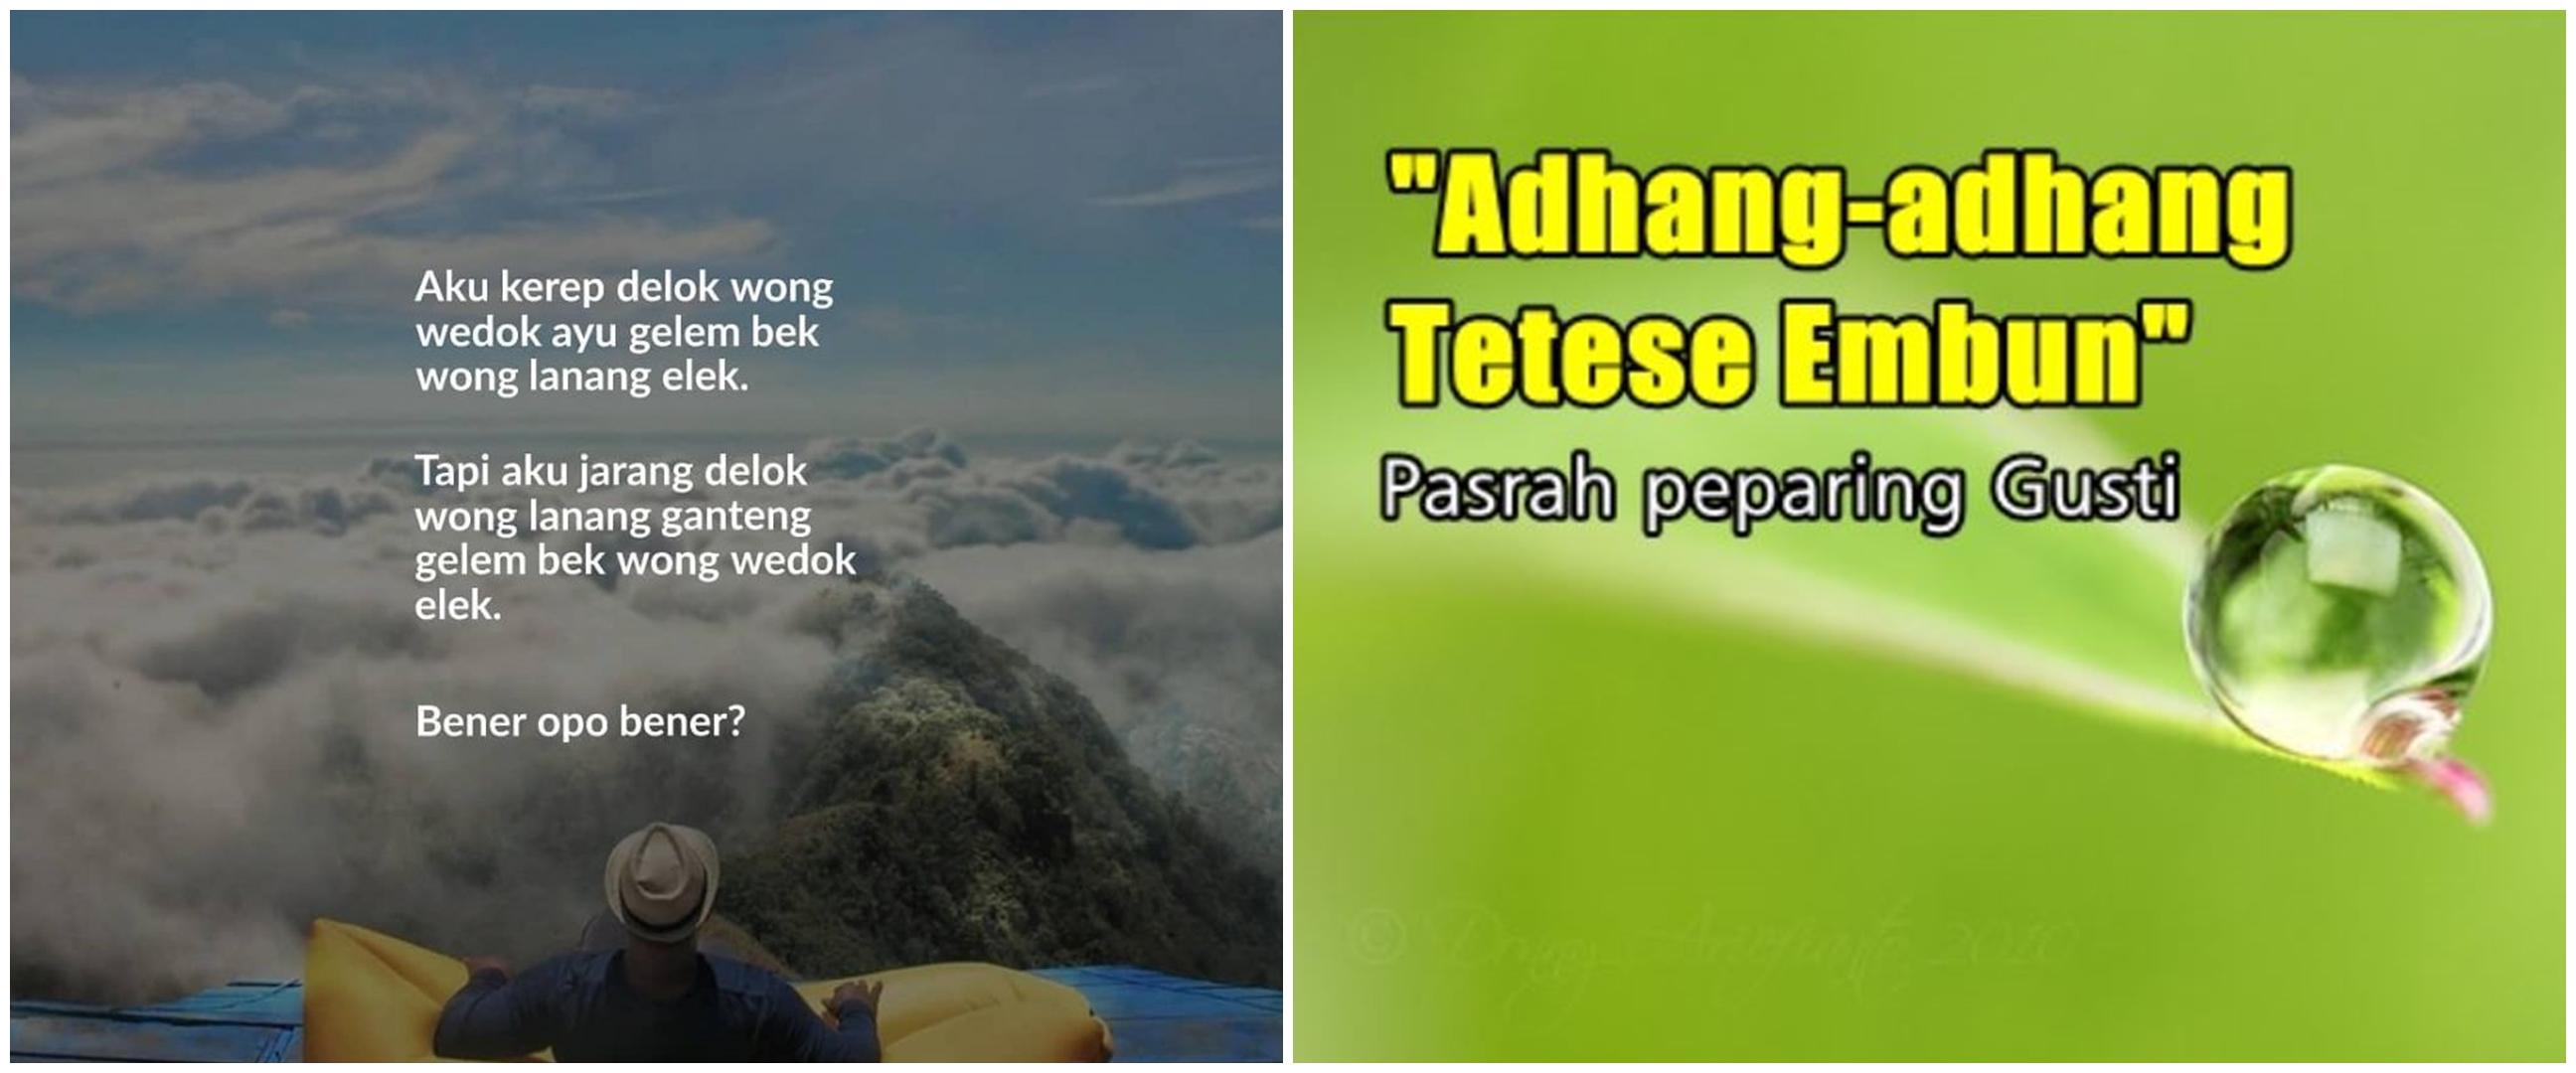 103 Kata-kata bijak bahasa Jawa tentang kehidupan, penuh motivasi